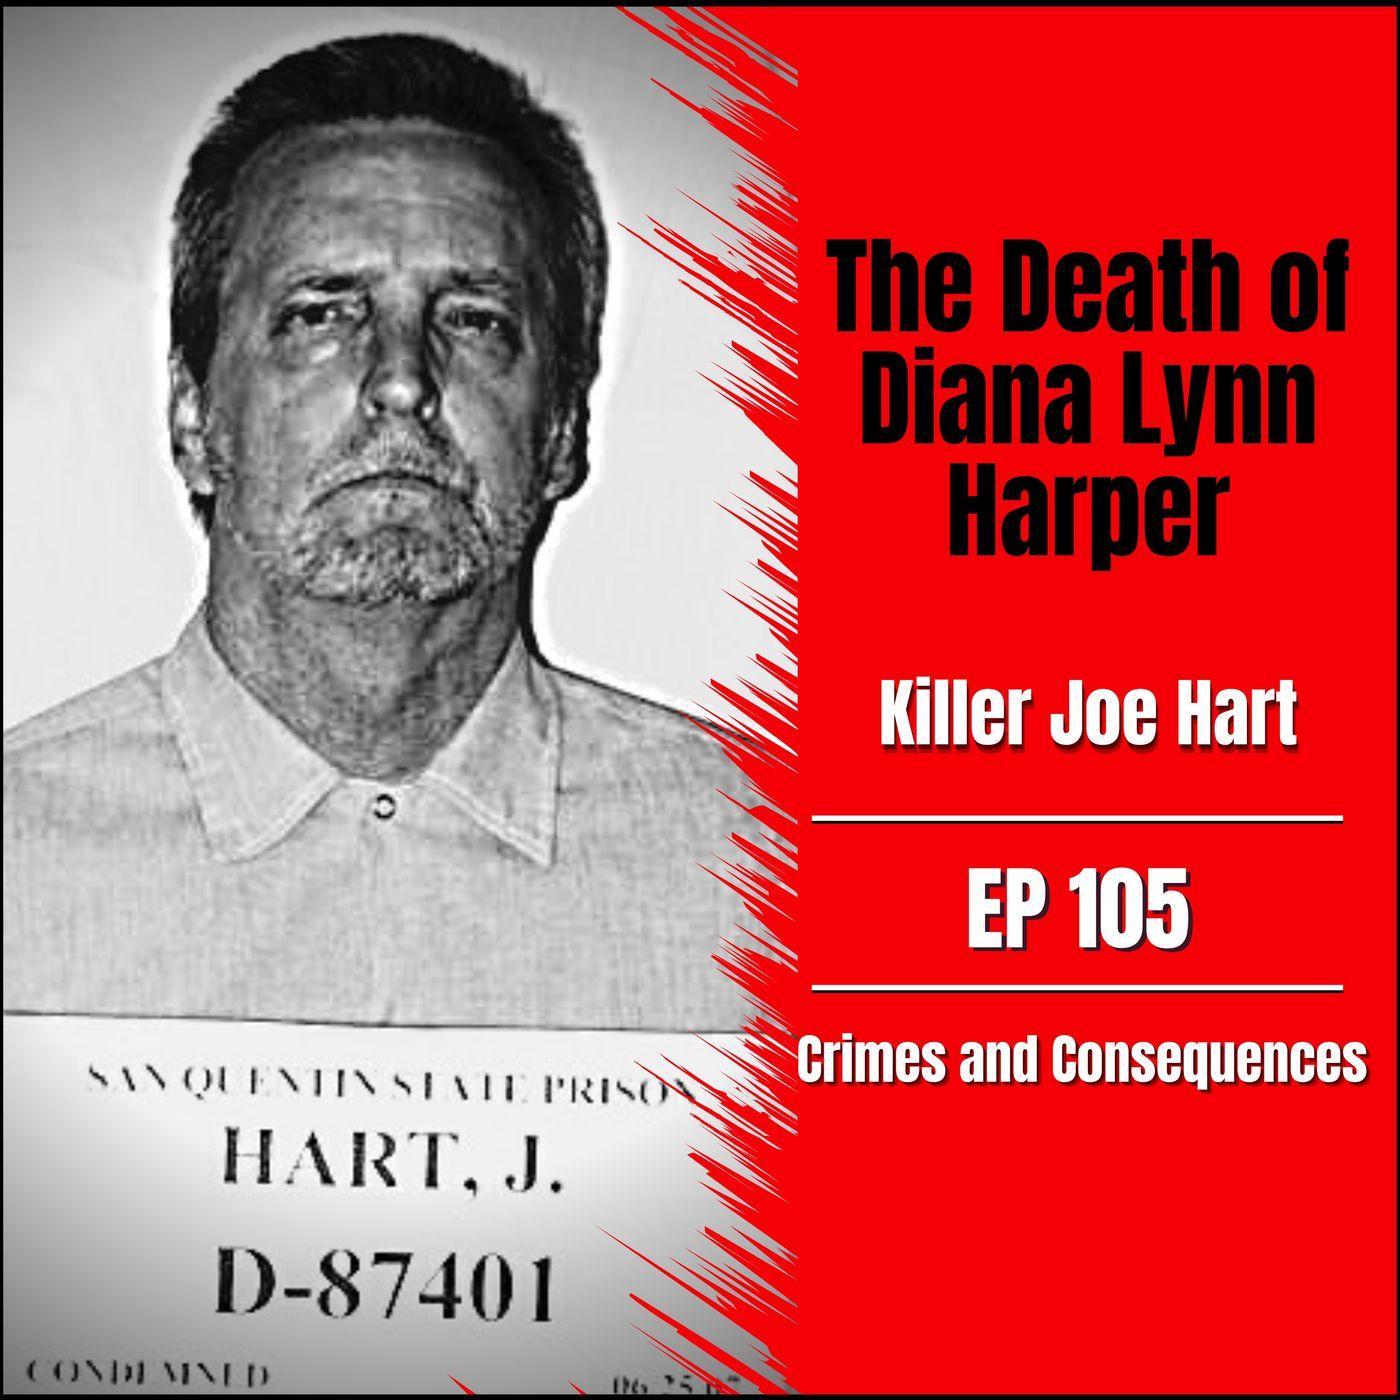 EP105: The Death of Diana Lynn Harper